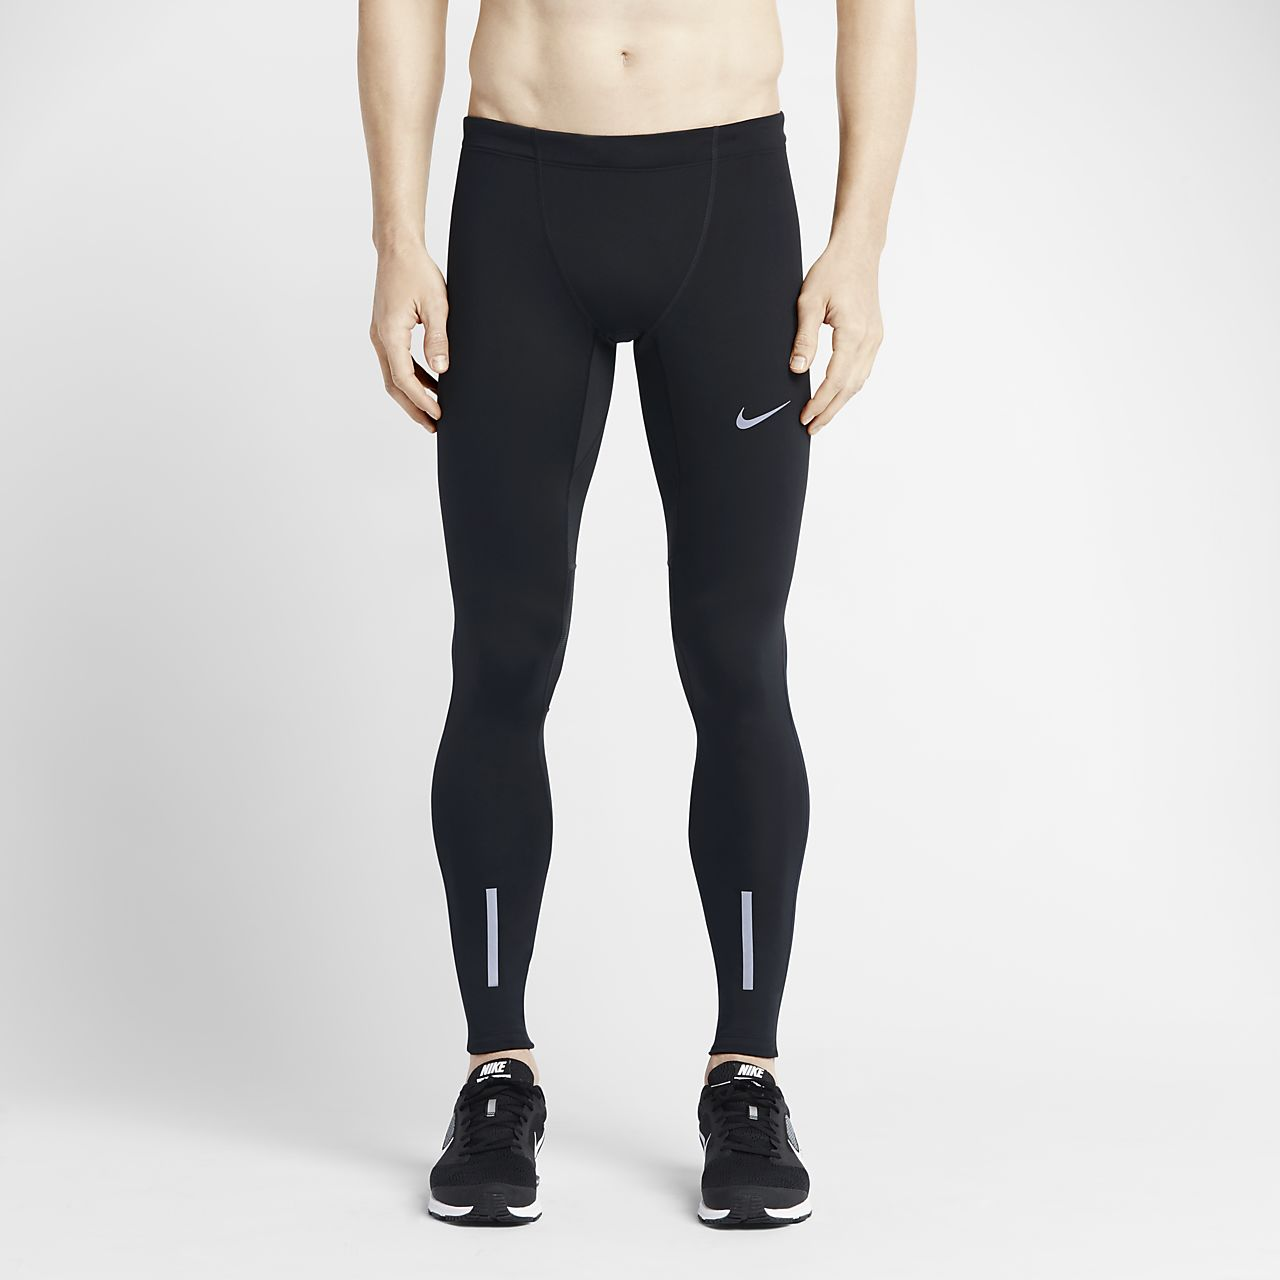 8d7b4cd4b066 Ανδρικό κολάν για τρέξιμο Nike Power Tech. Nike.com GR